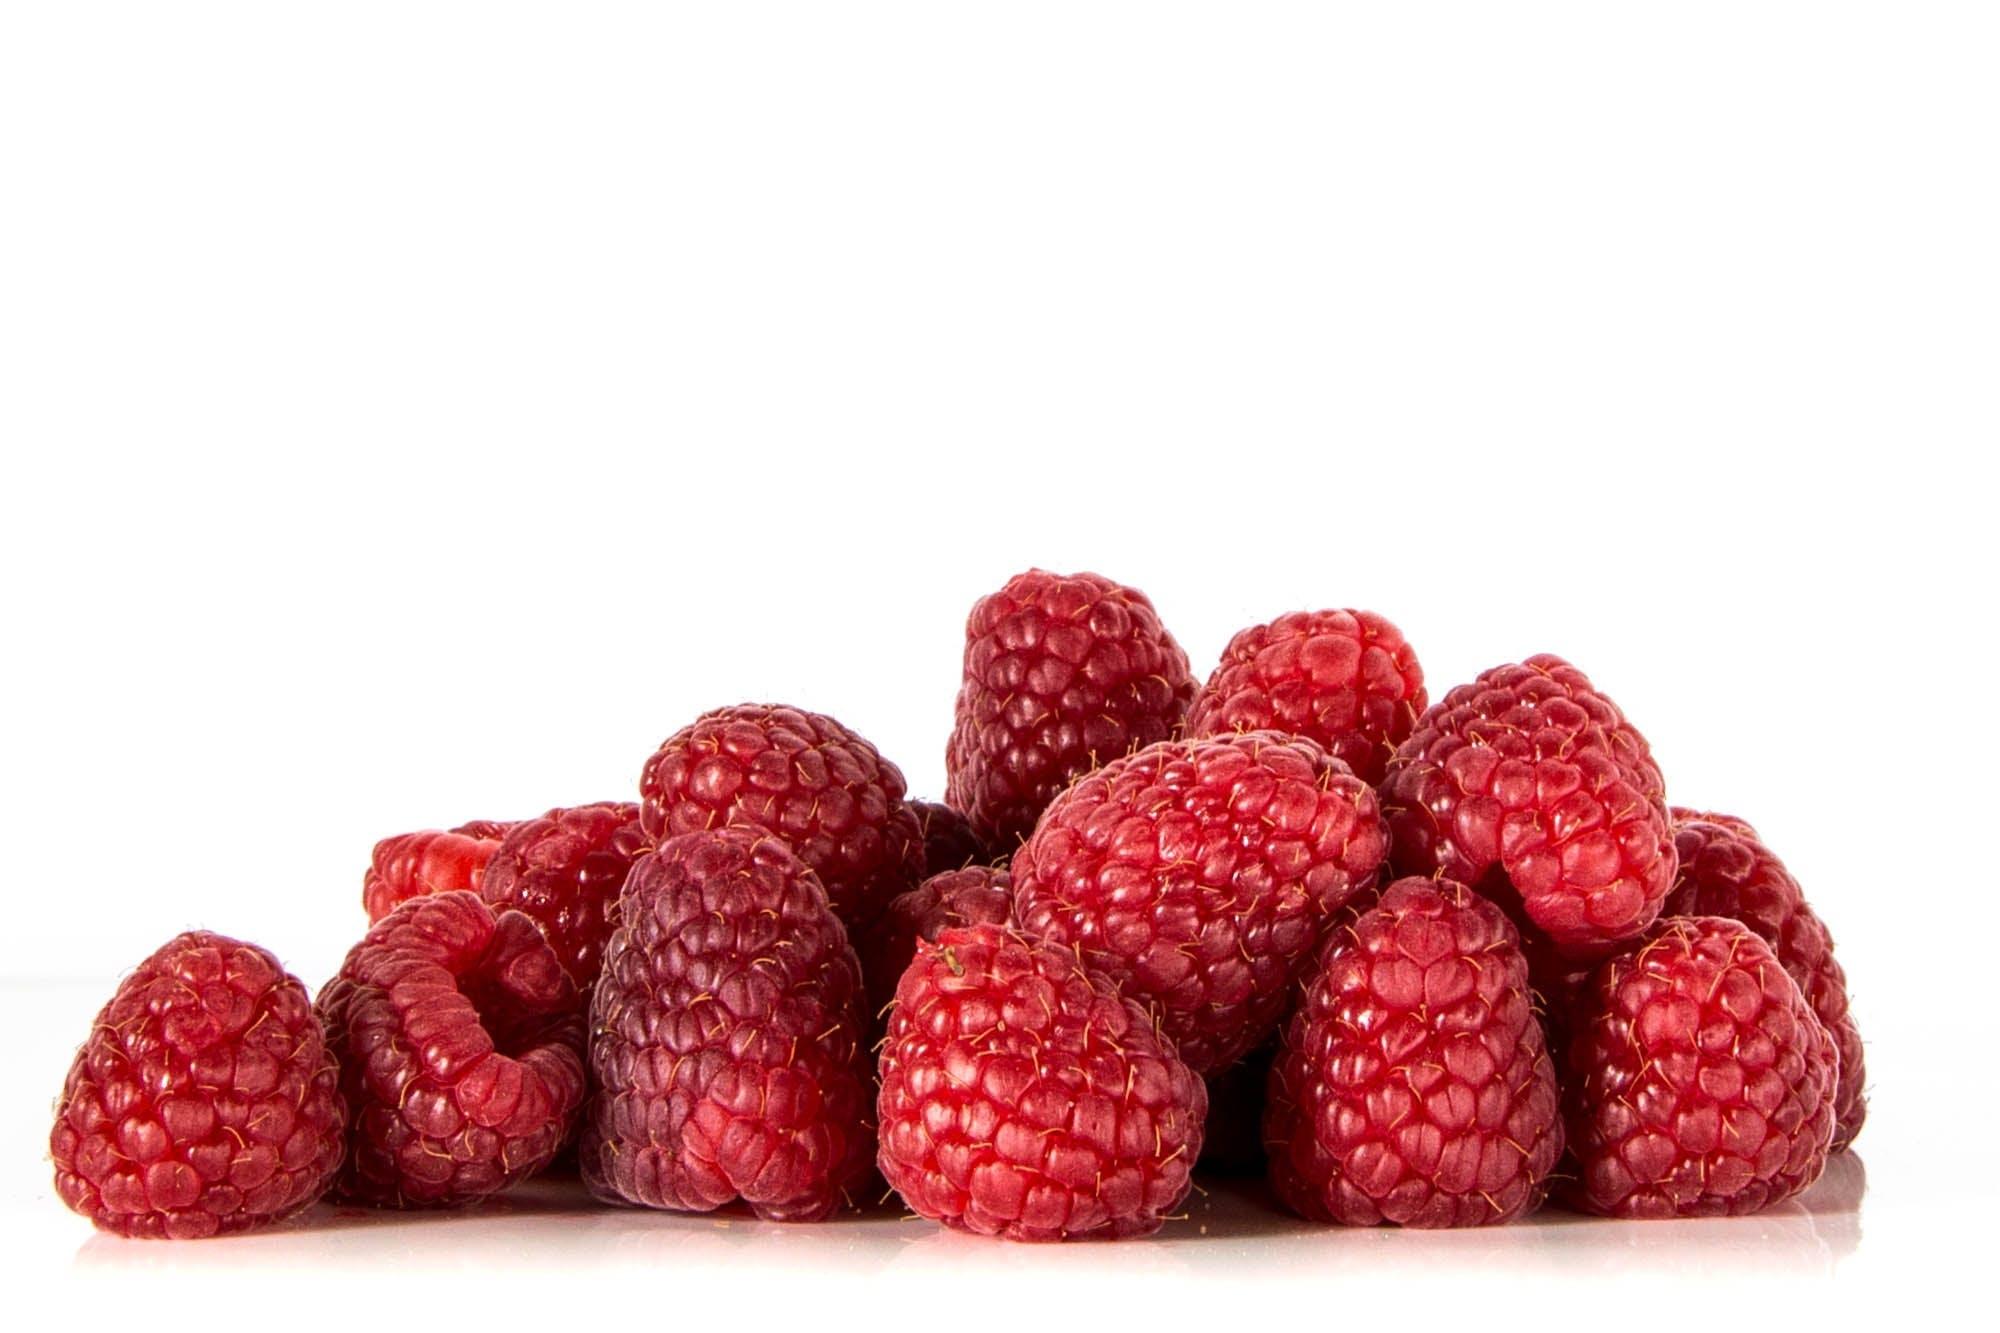 Free stock photo of food, raspberries, power, fruit